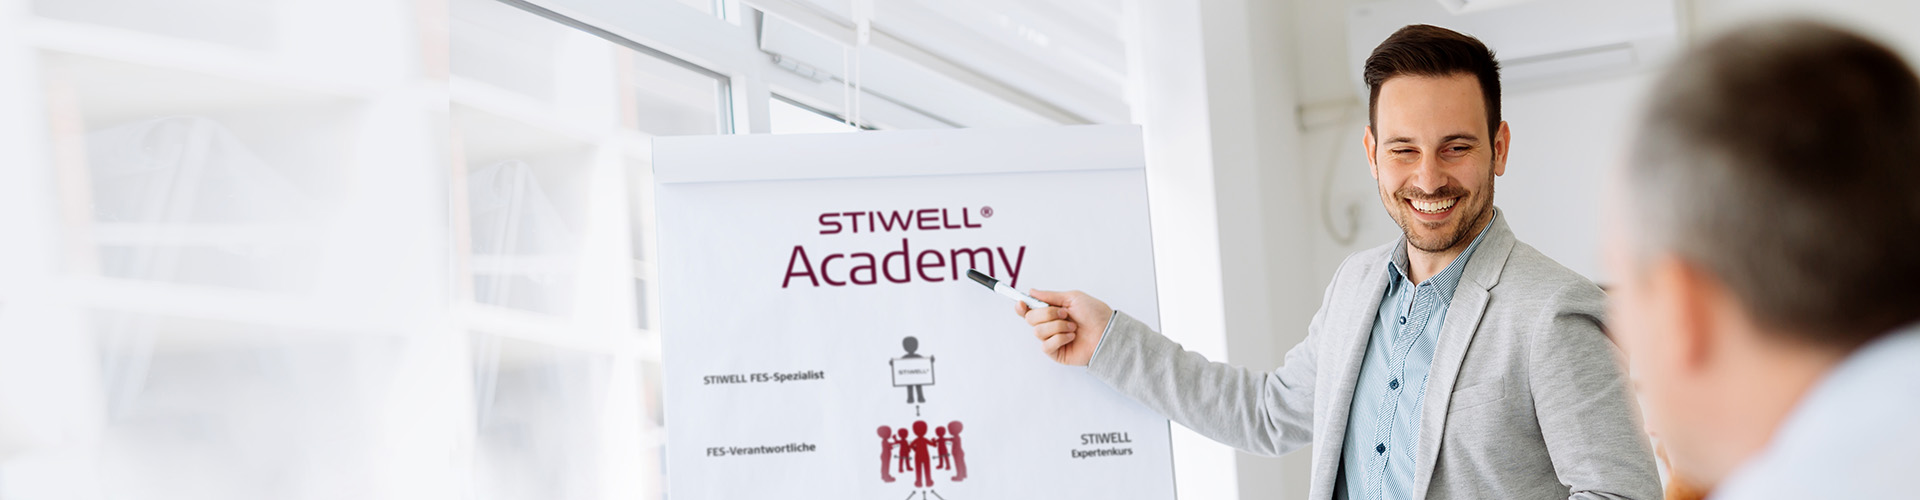 STIWELL Neurorehabilitation | STIWELL Academy